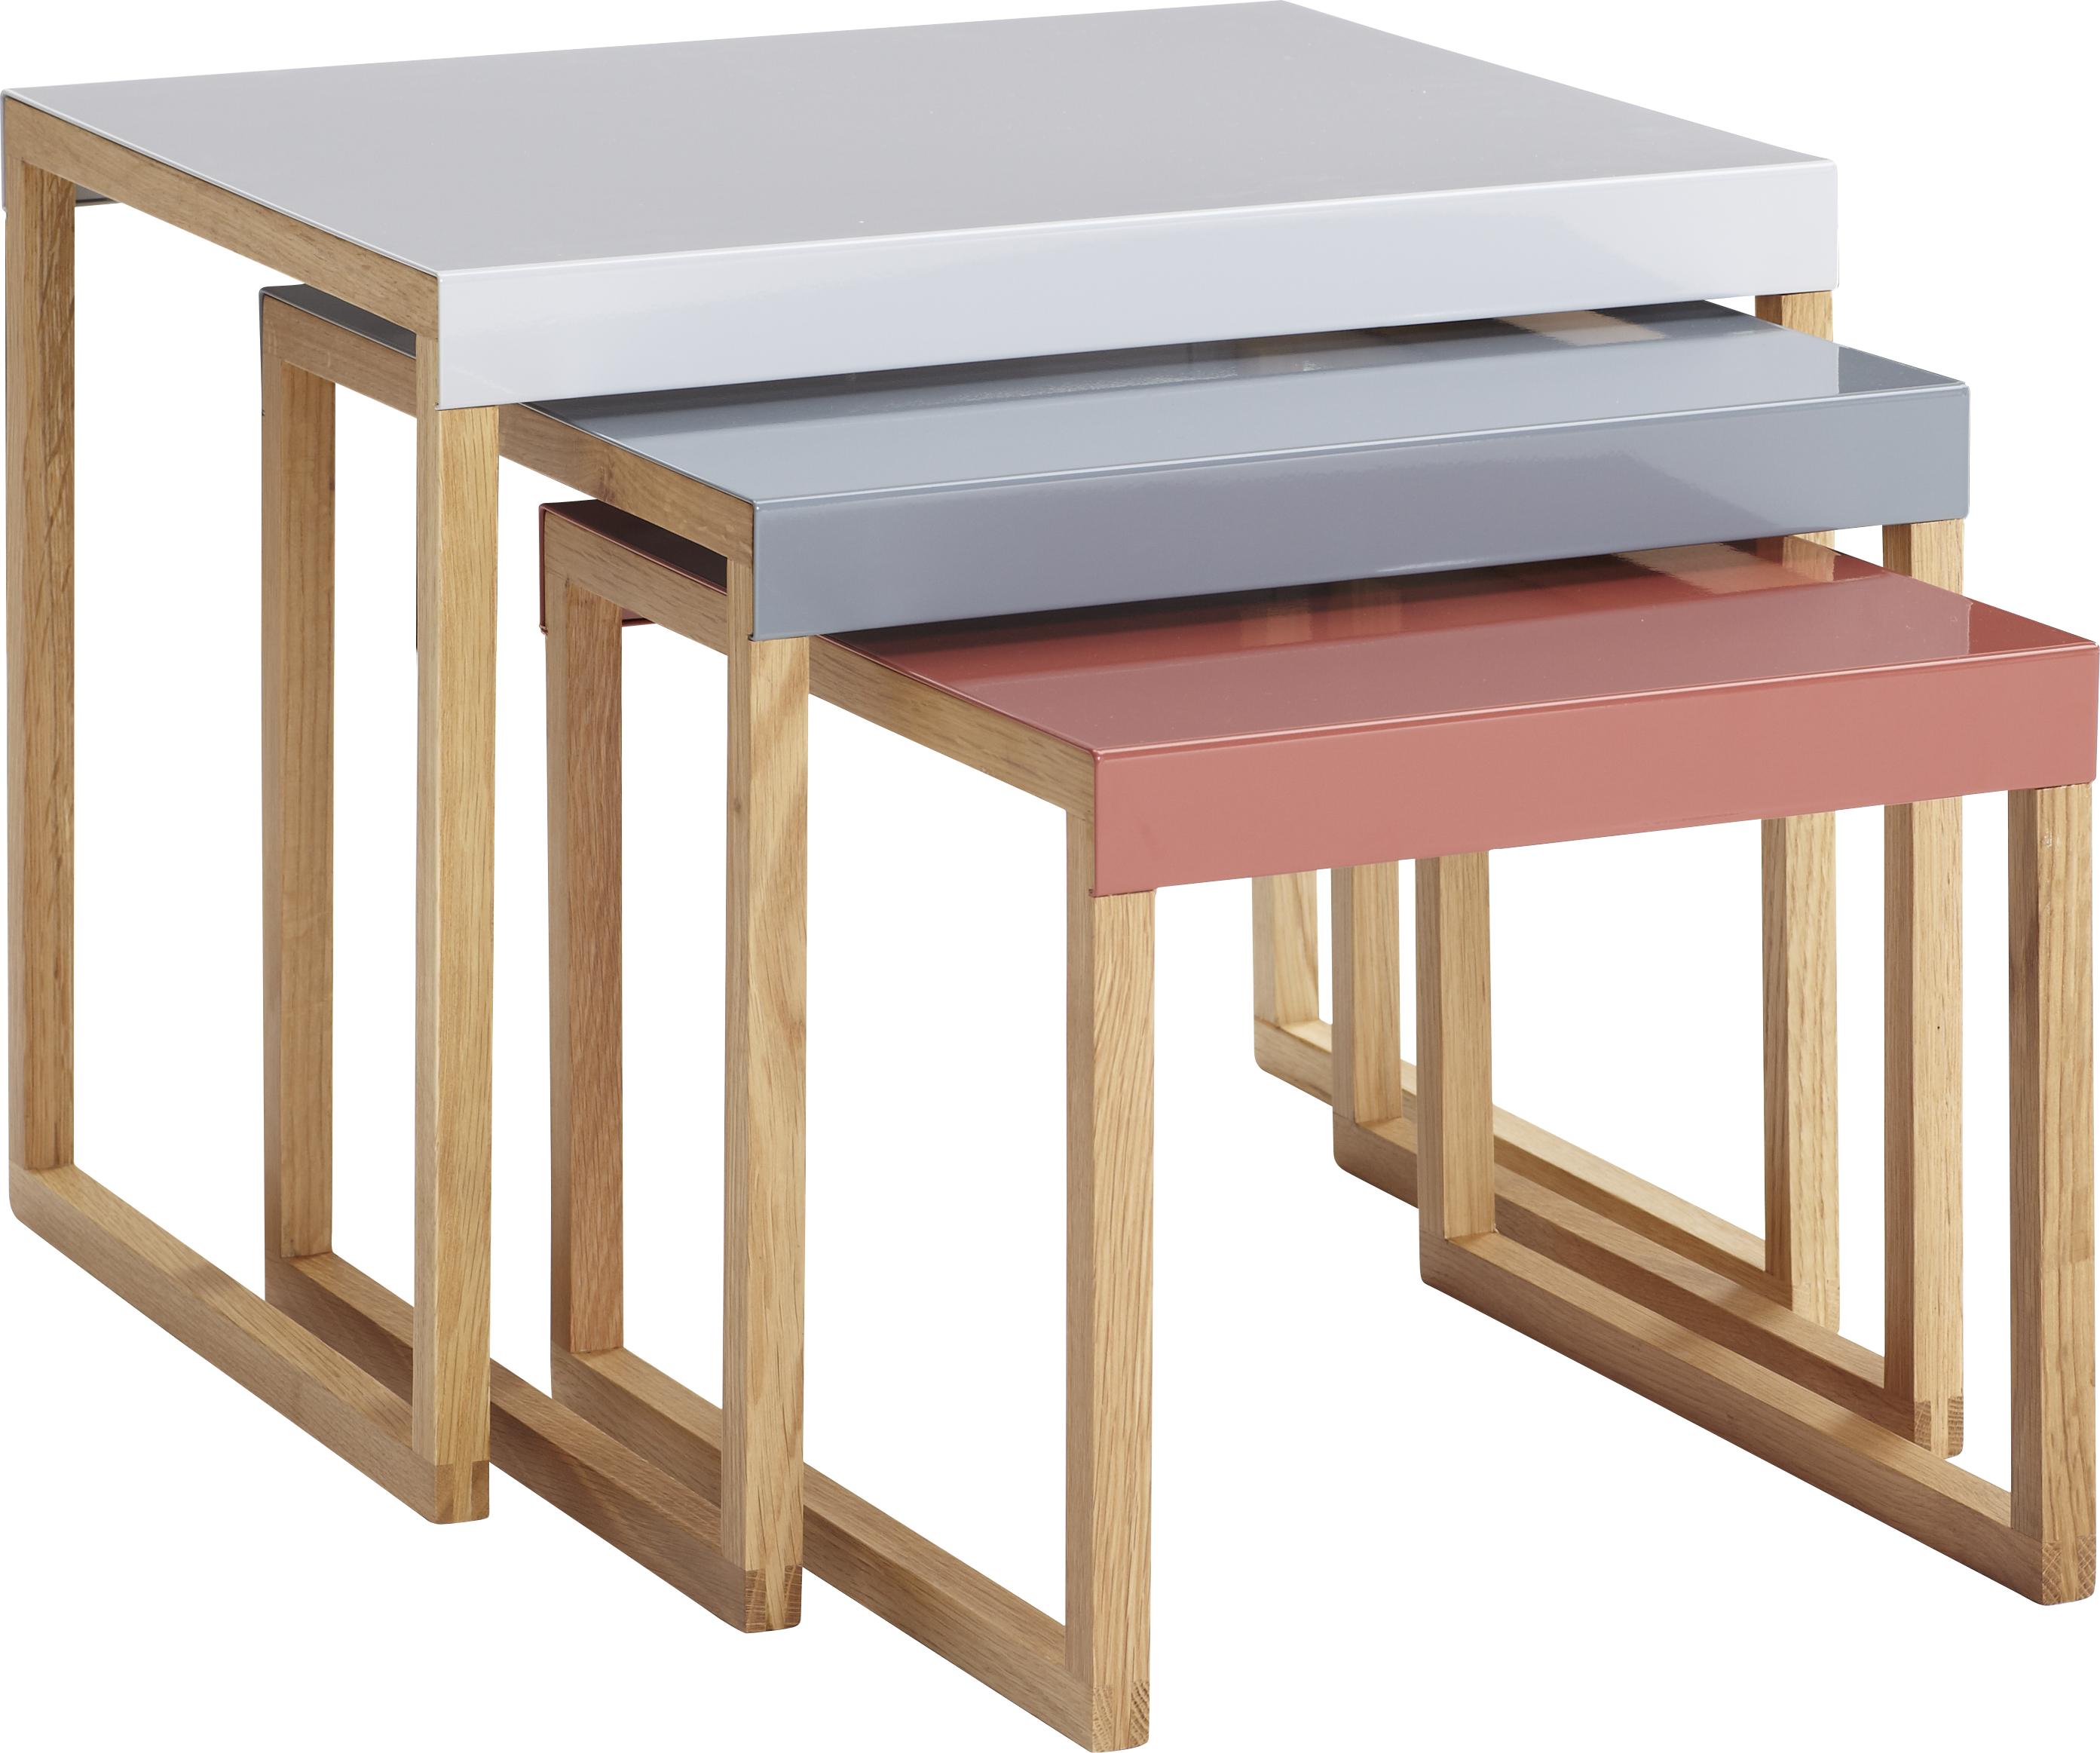 Kilo Tables Gigogne Tables Gigognes Table Basse Mobilier De Salon